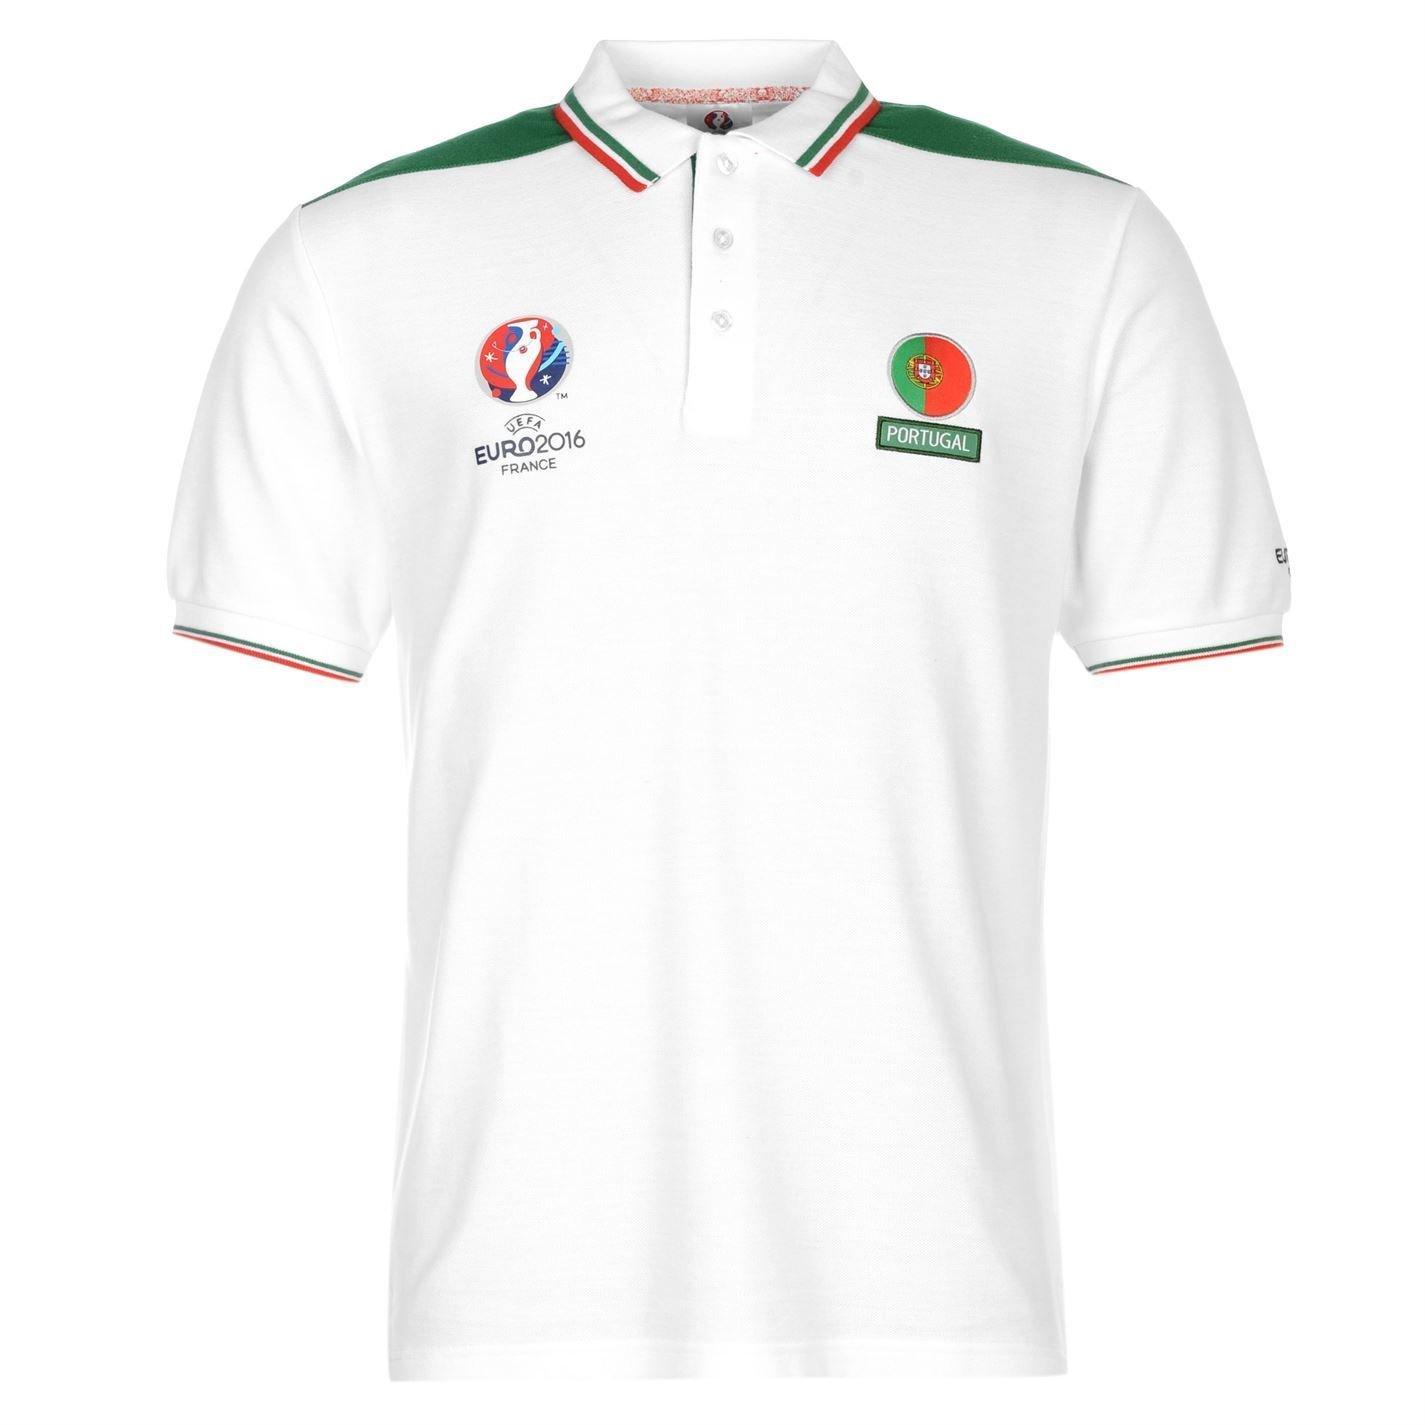 UEFA Euro 2016 Portugal Polo Camisa para Hombre Blanco/Verde de ...